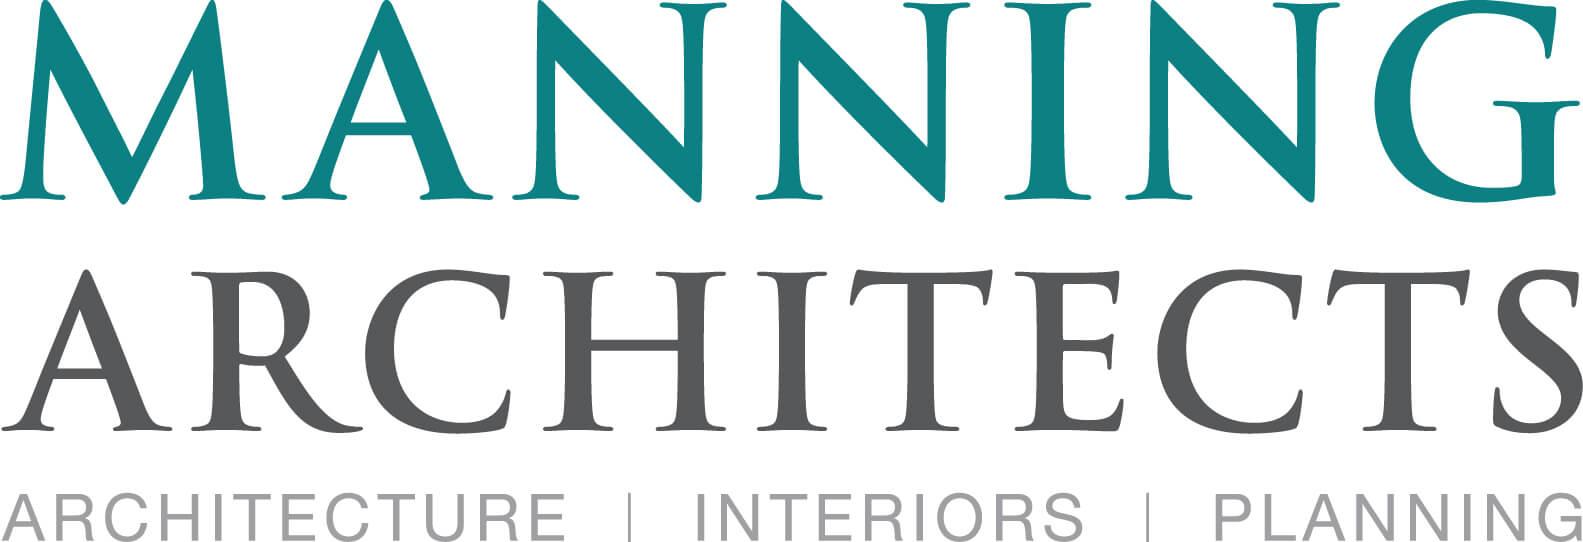 Manning Architects logo.jpg